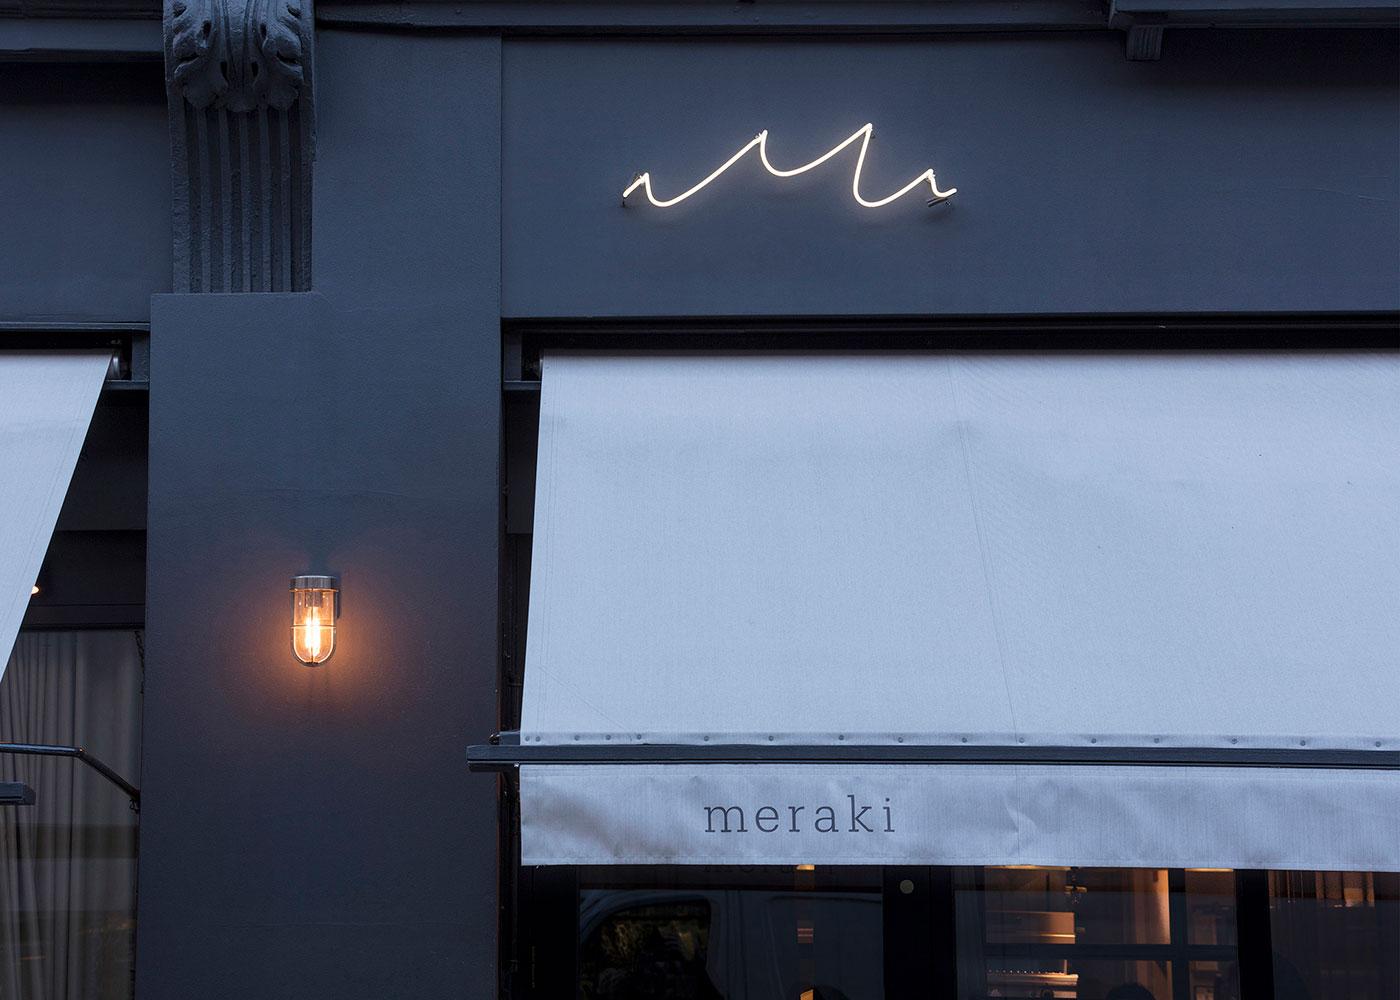 Meraki Restaurant signage